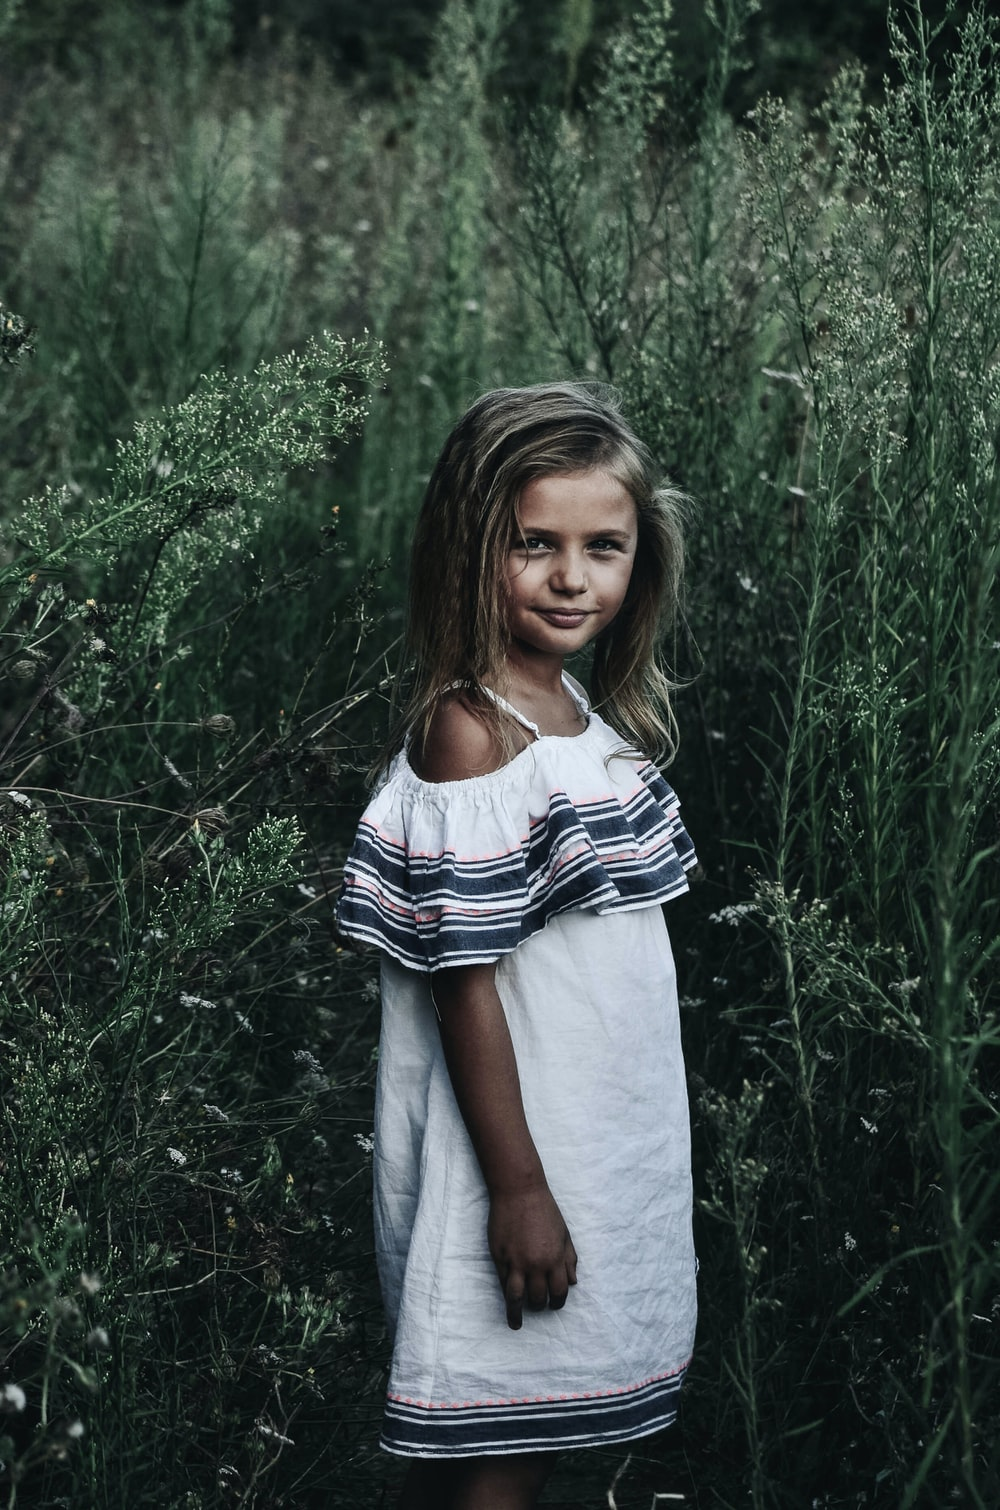 girl standing near tall grasses